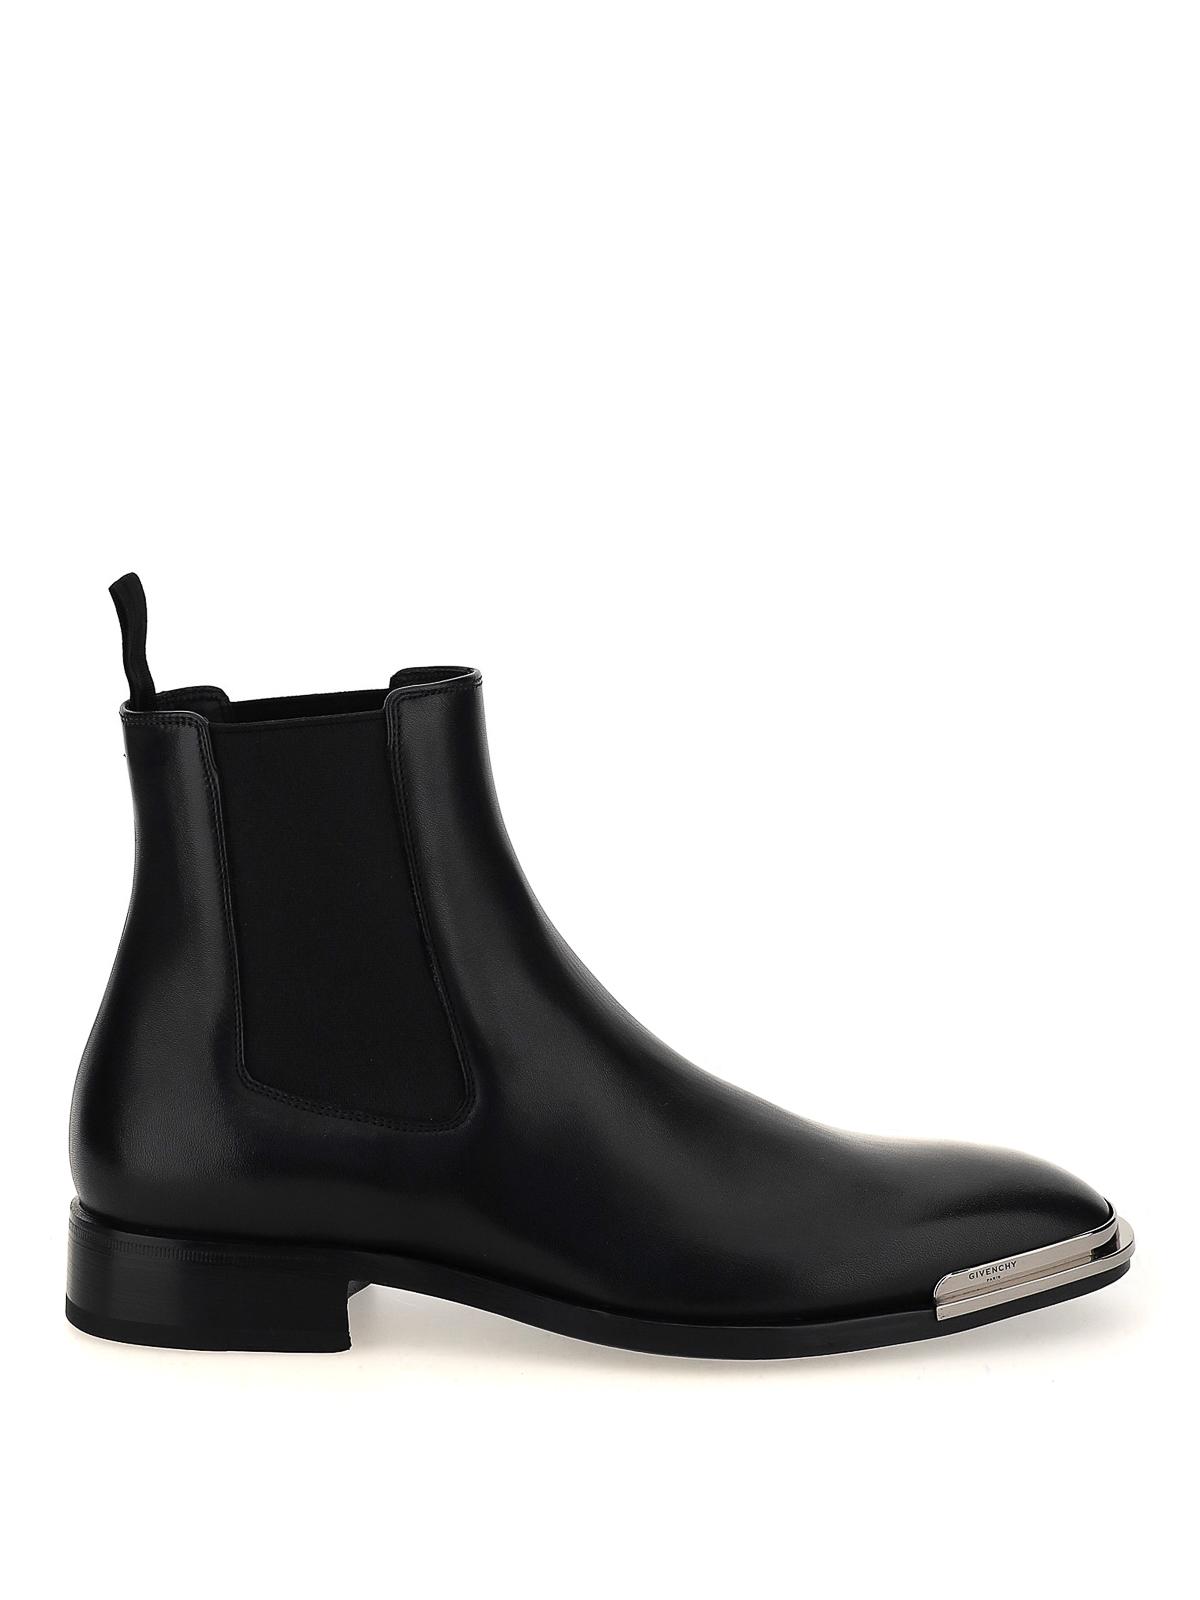 Givenchy METALLIC TOE CHELSEA BOOTS